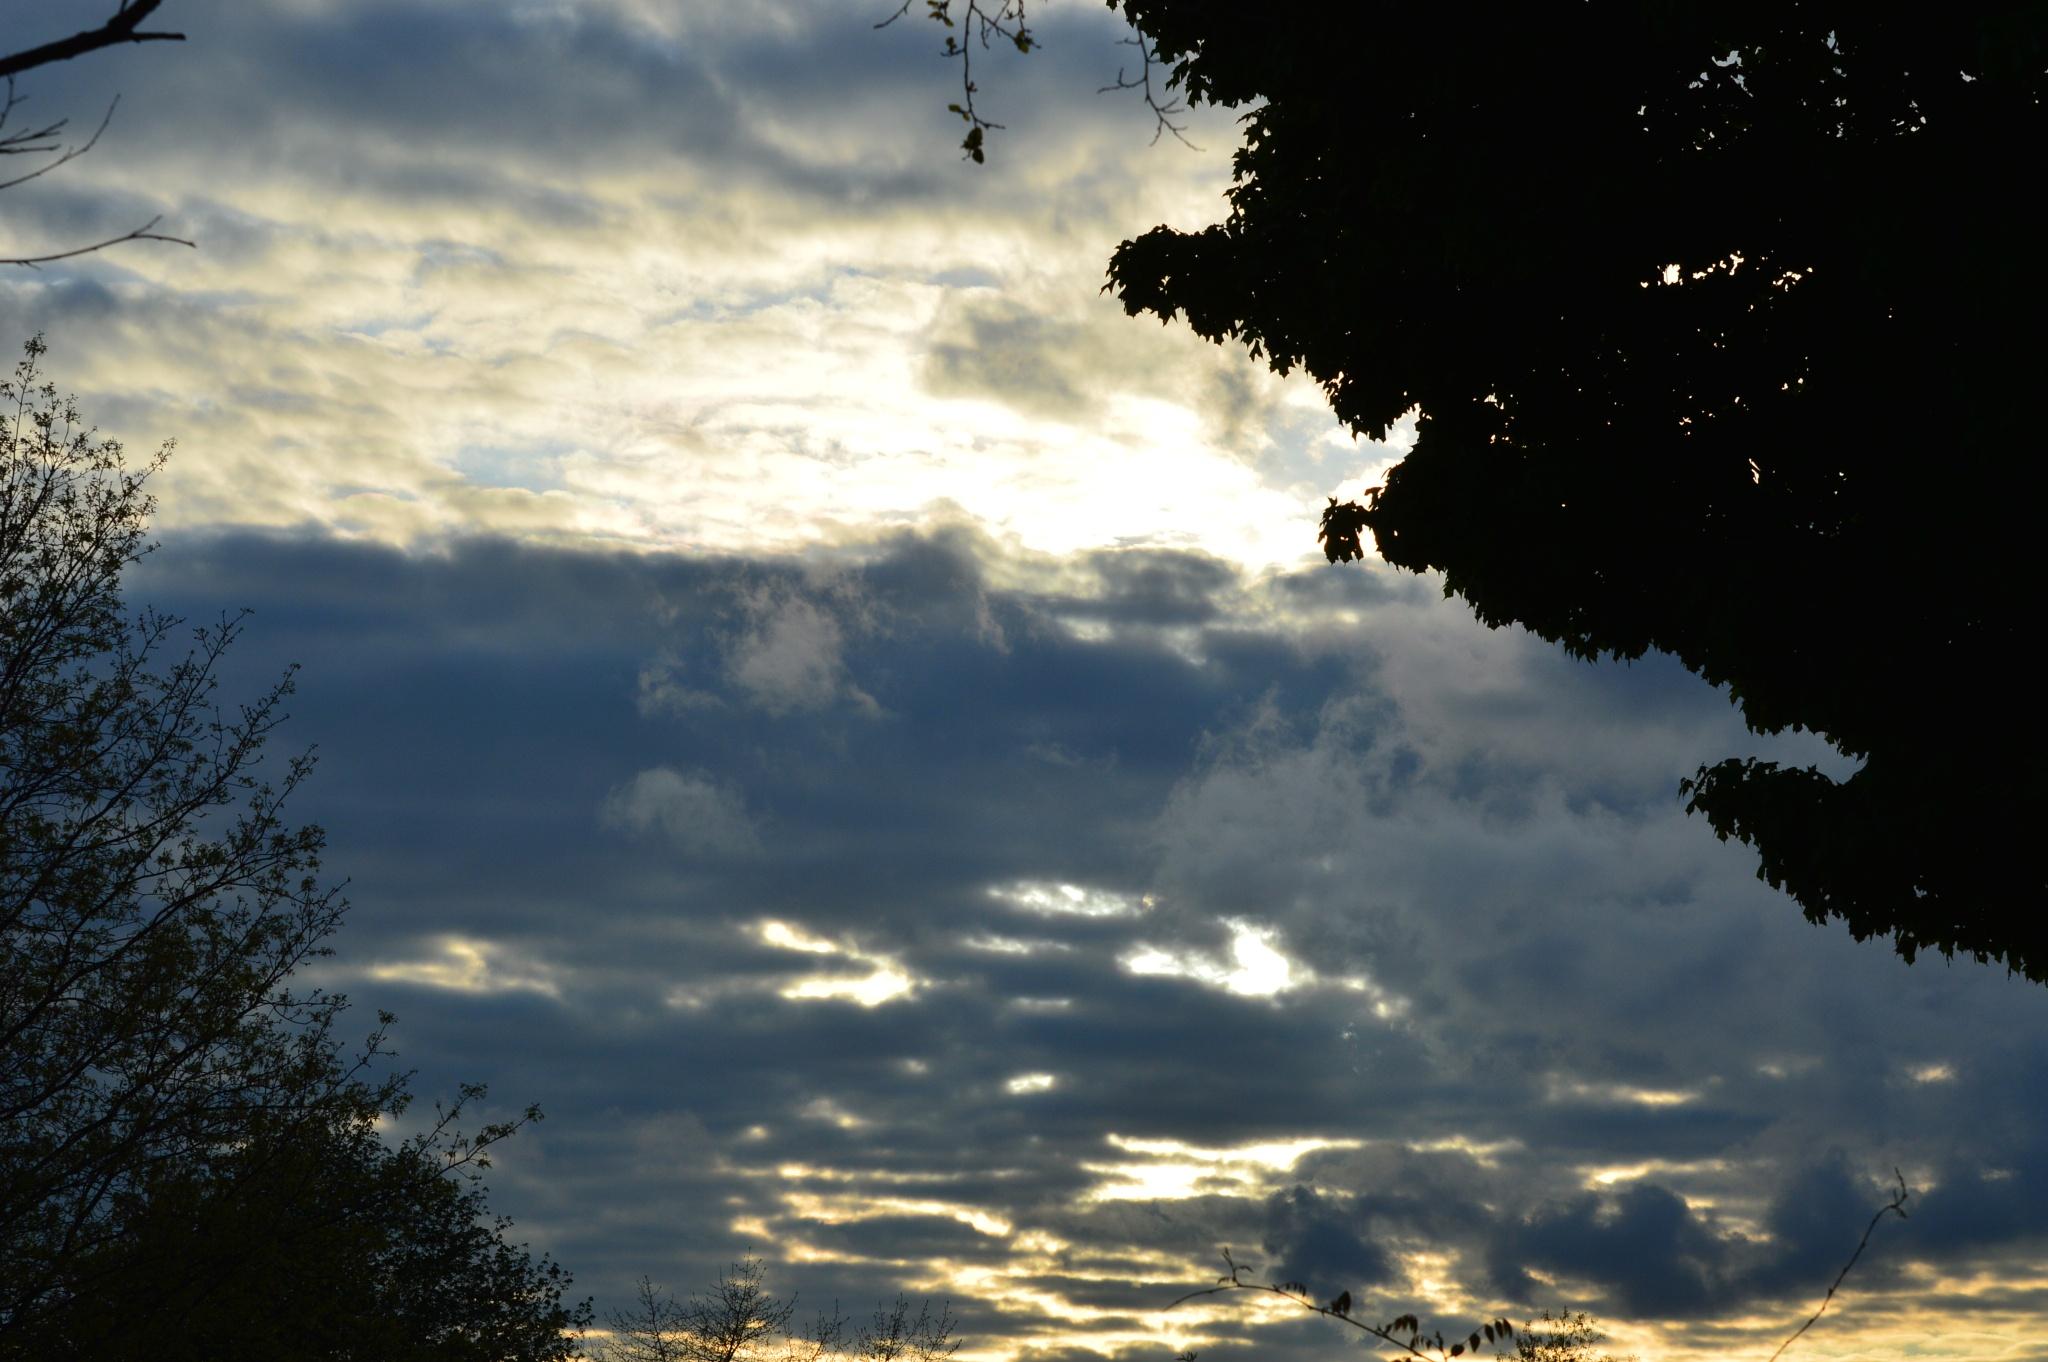 Clouds  by ERock23